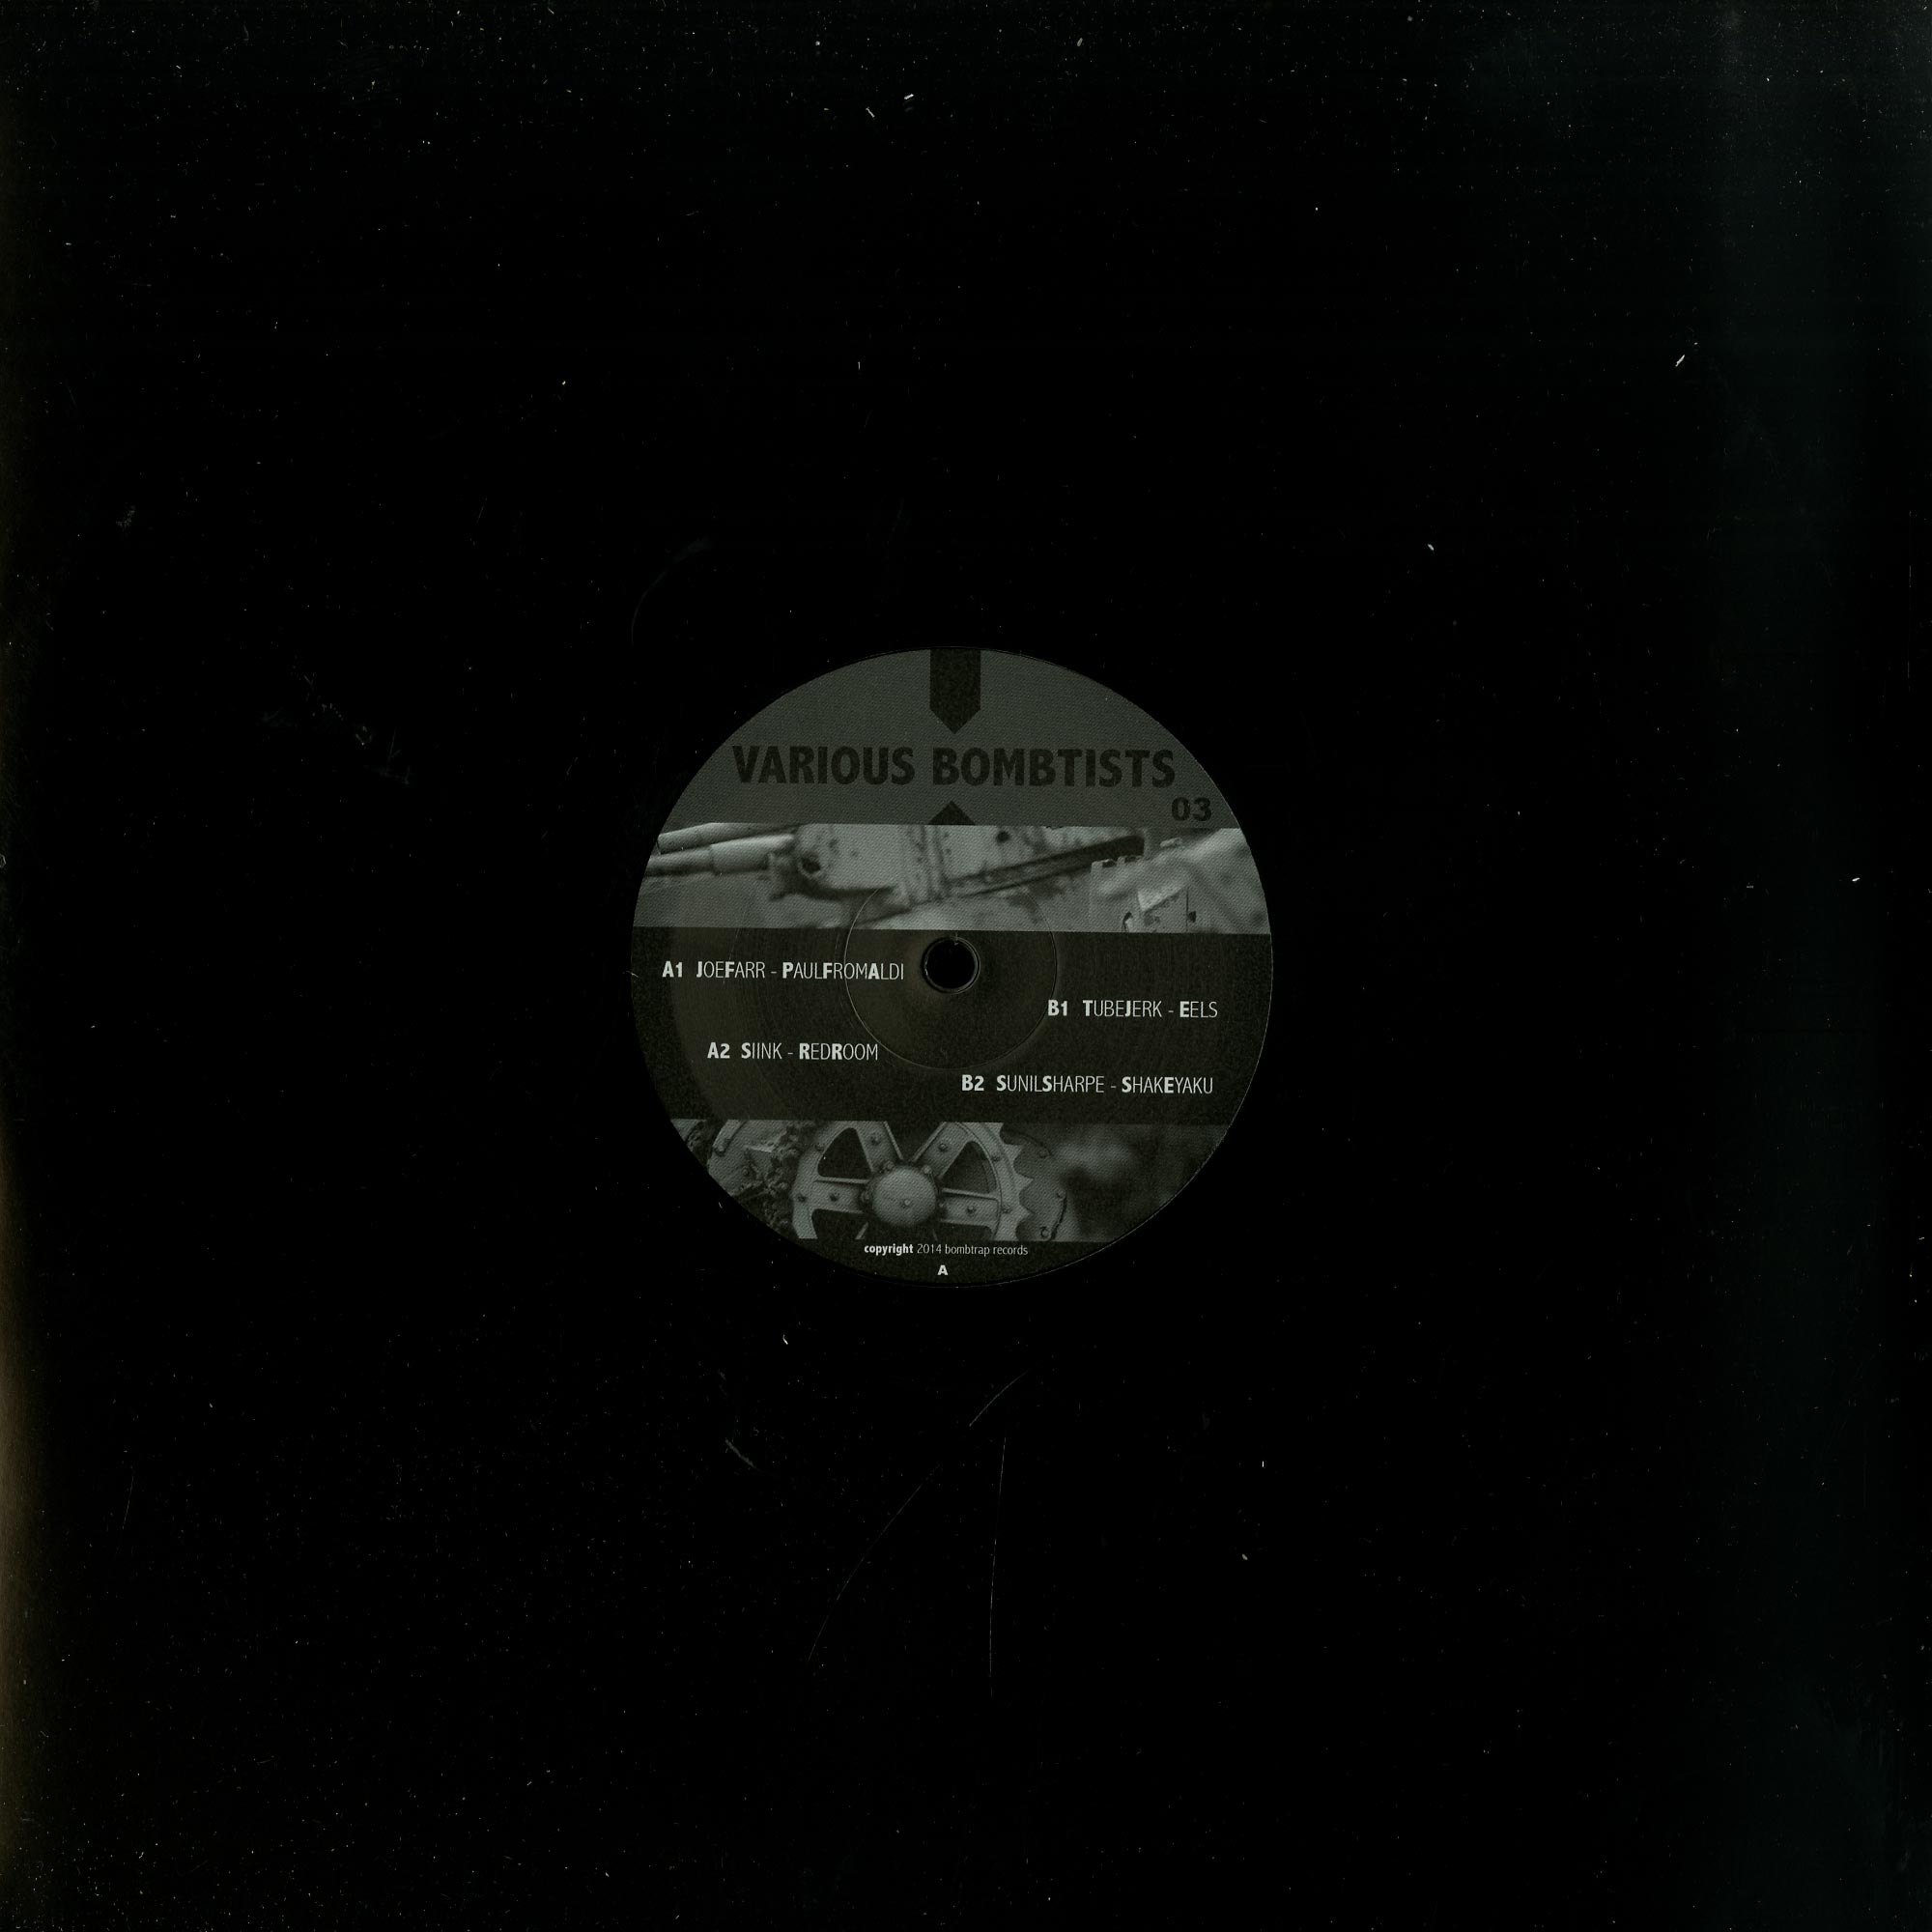 Various Artists - VARIOUS BOMBTISTS VOL 3